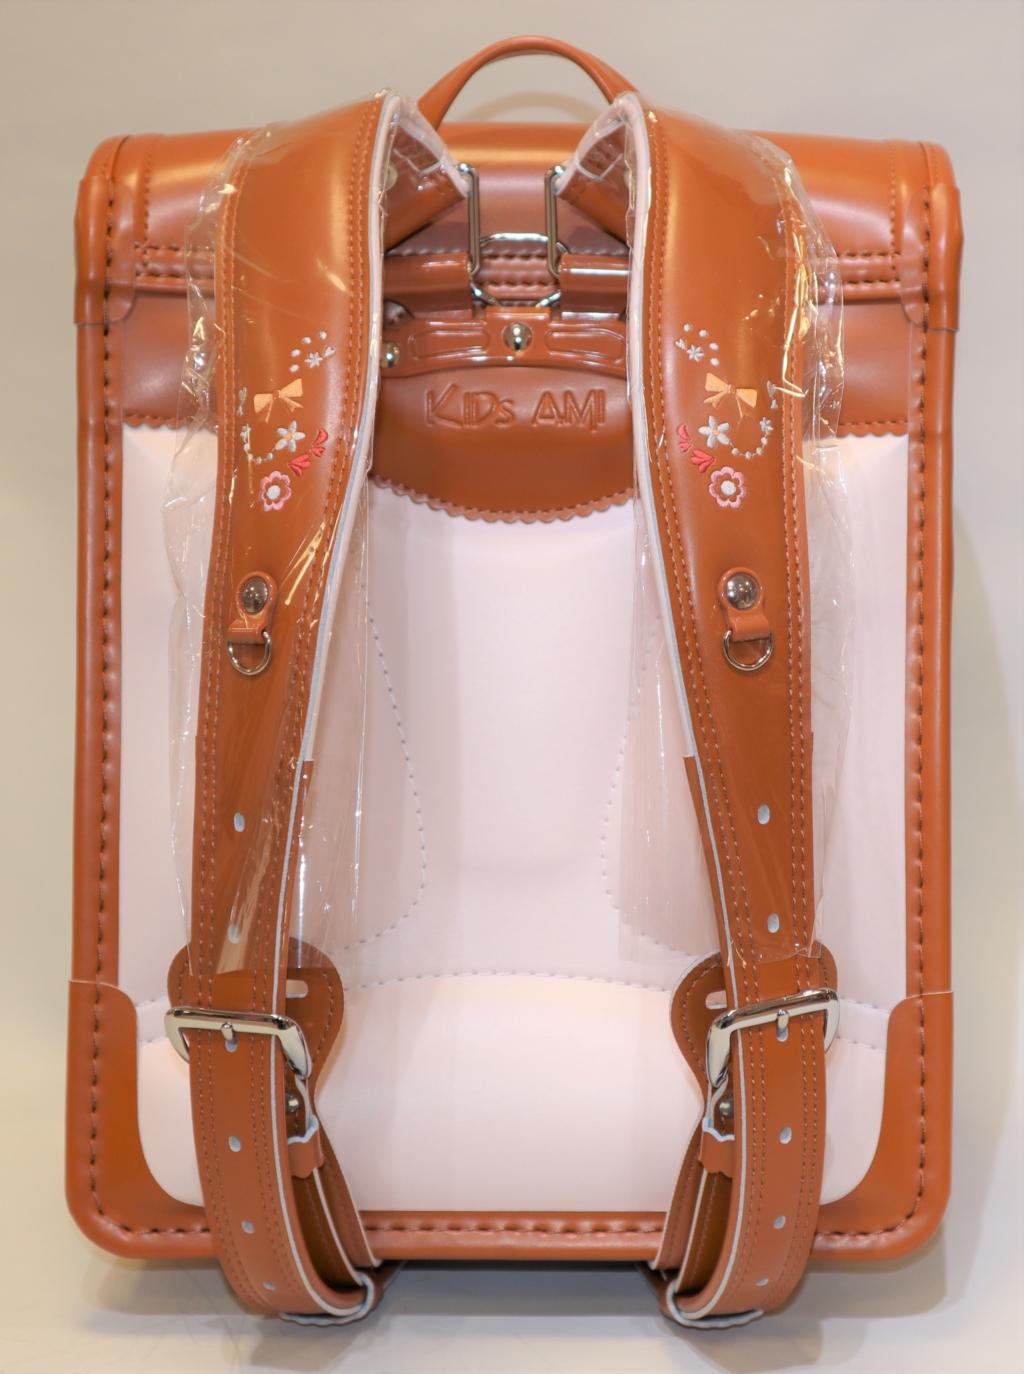 KIDsAMI ラビットワイド(軽量大マチ13.5cm)女の子カラー